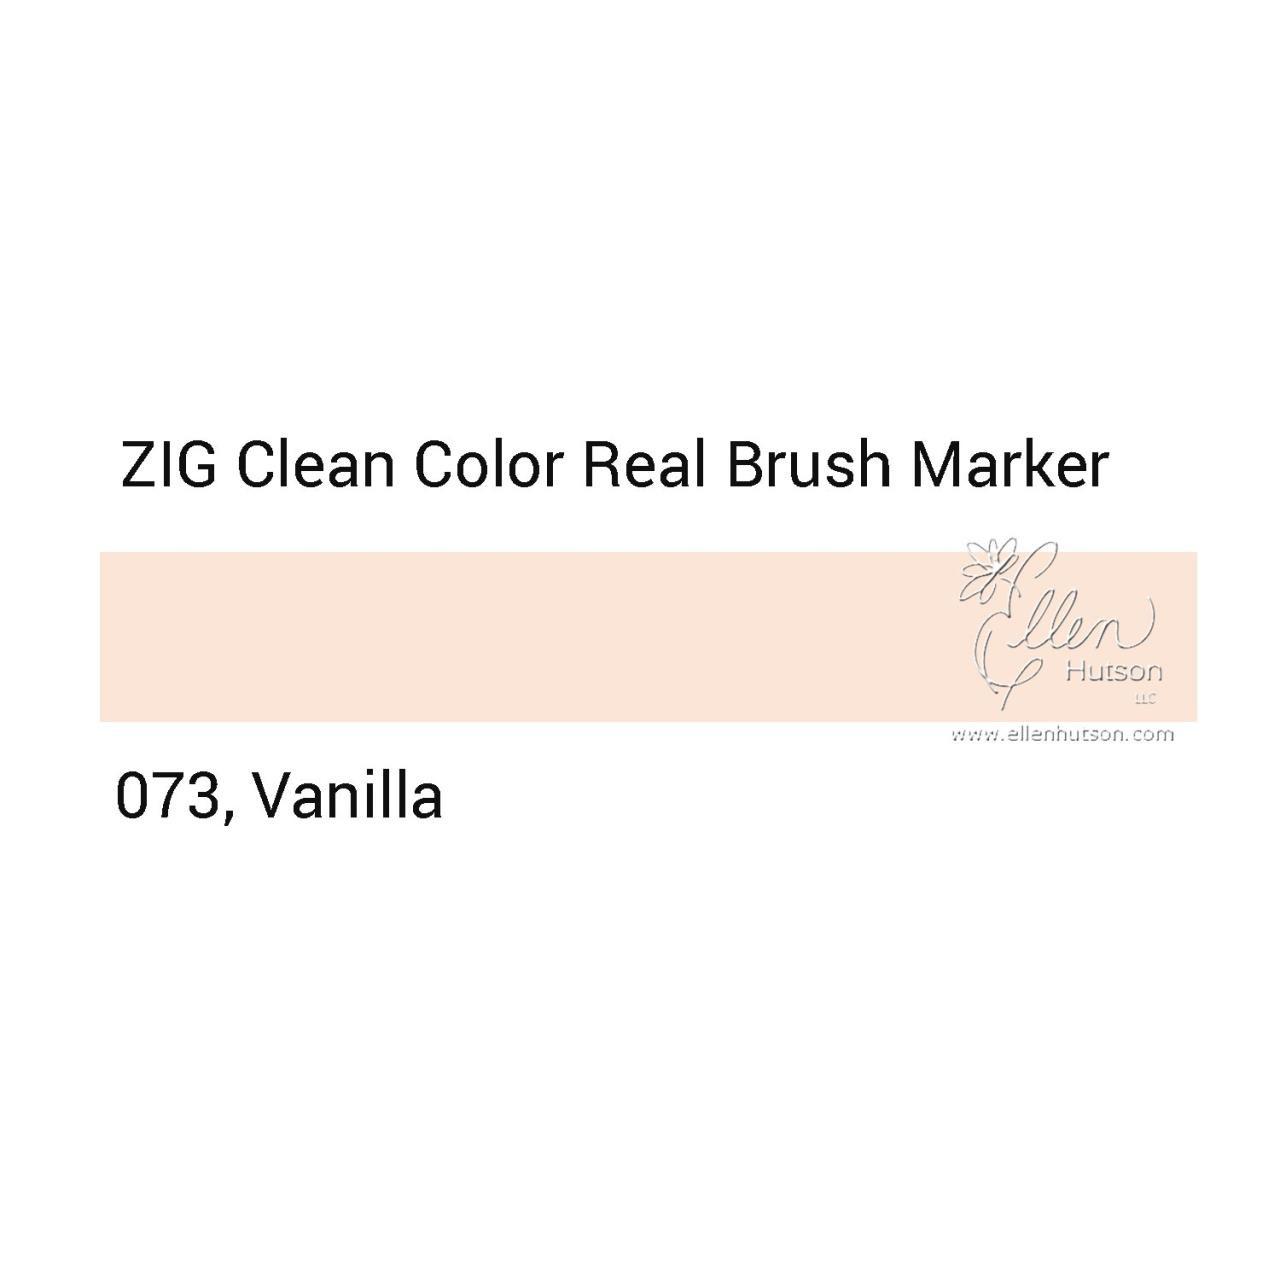 073 - Vanilla, ZIG Clean Color Real Brush Marker - 847340037088